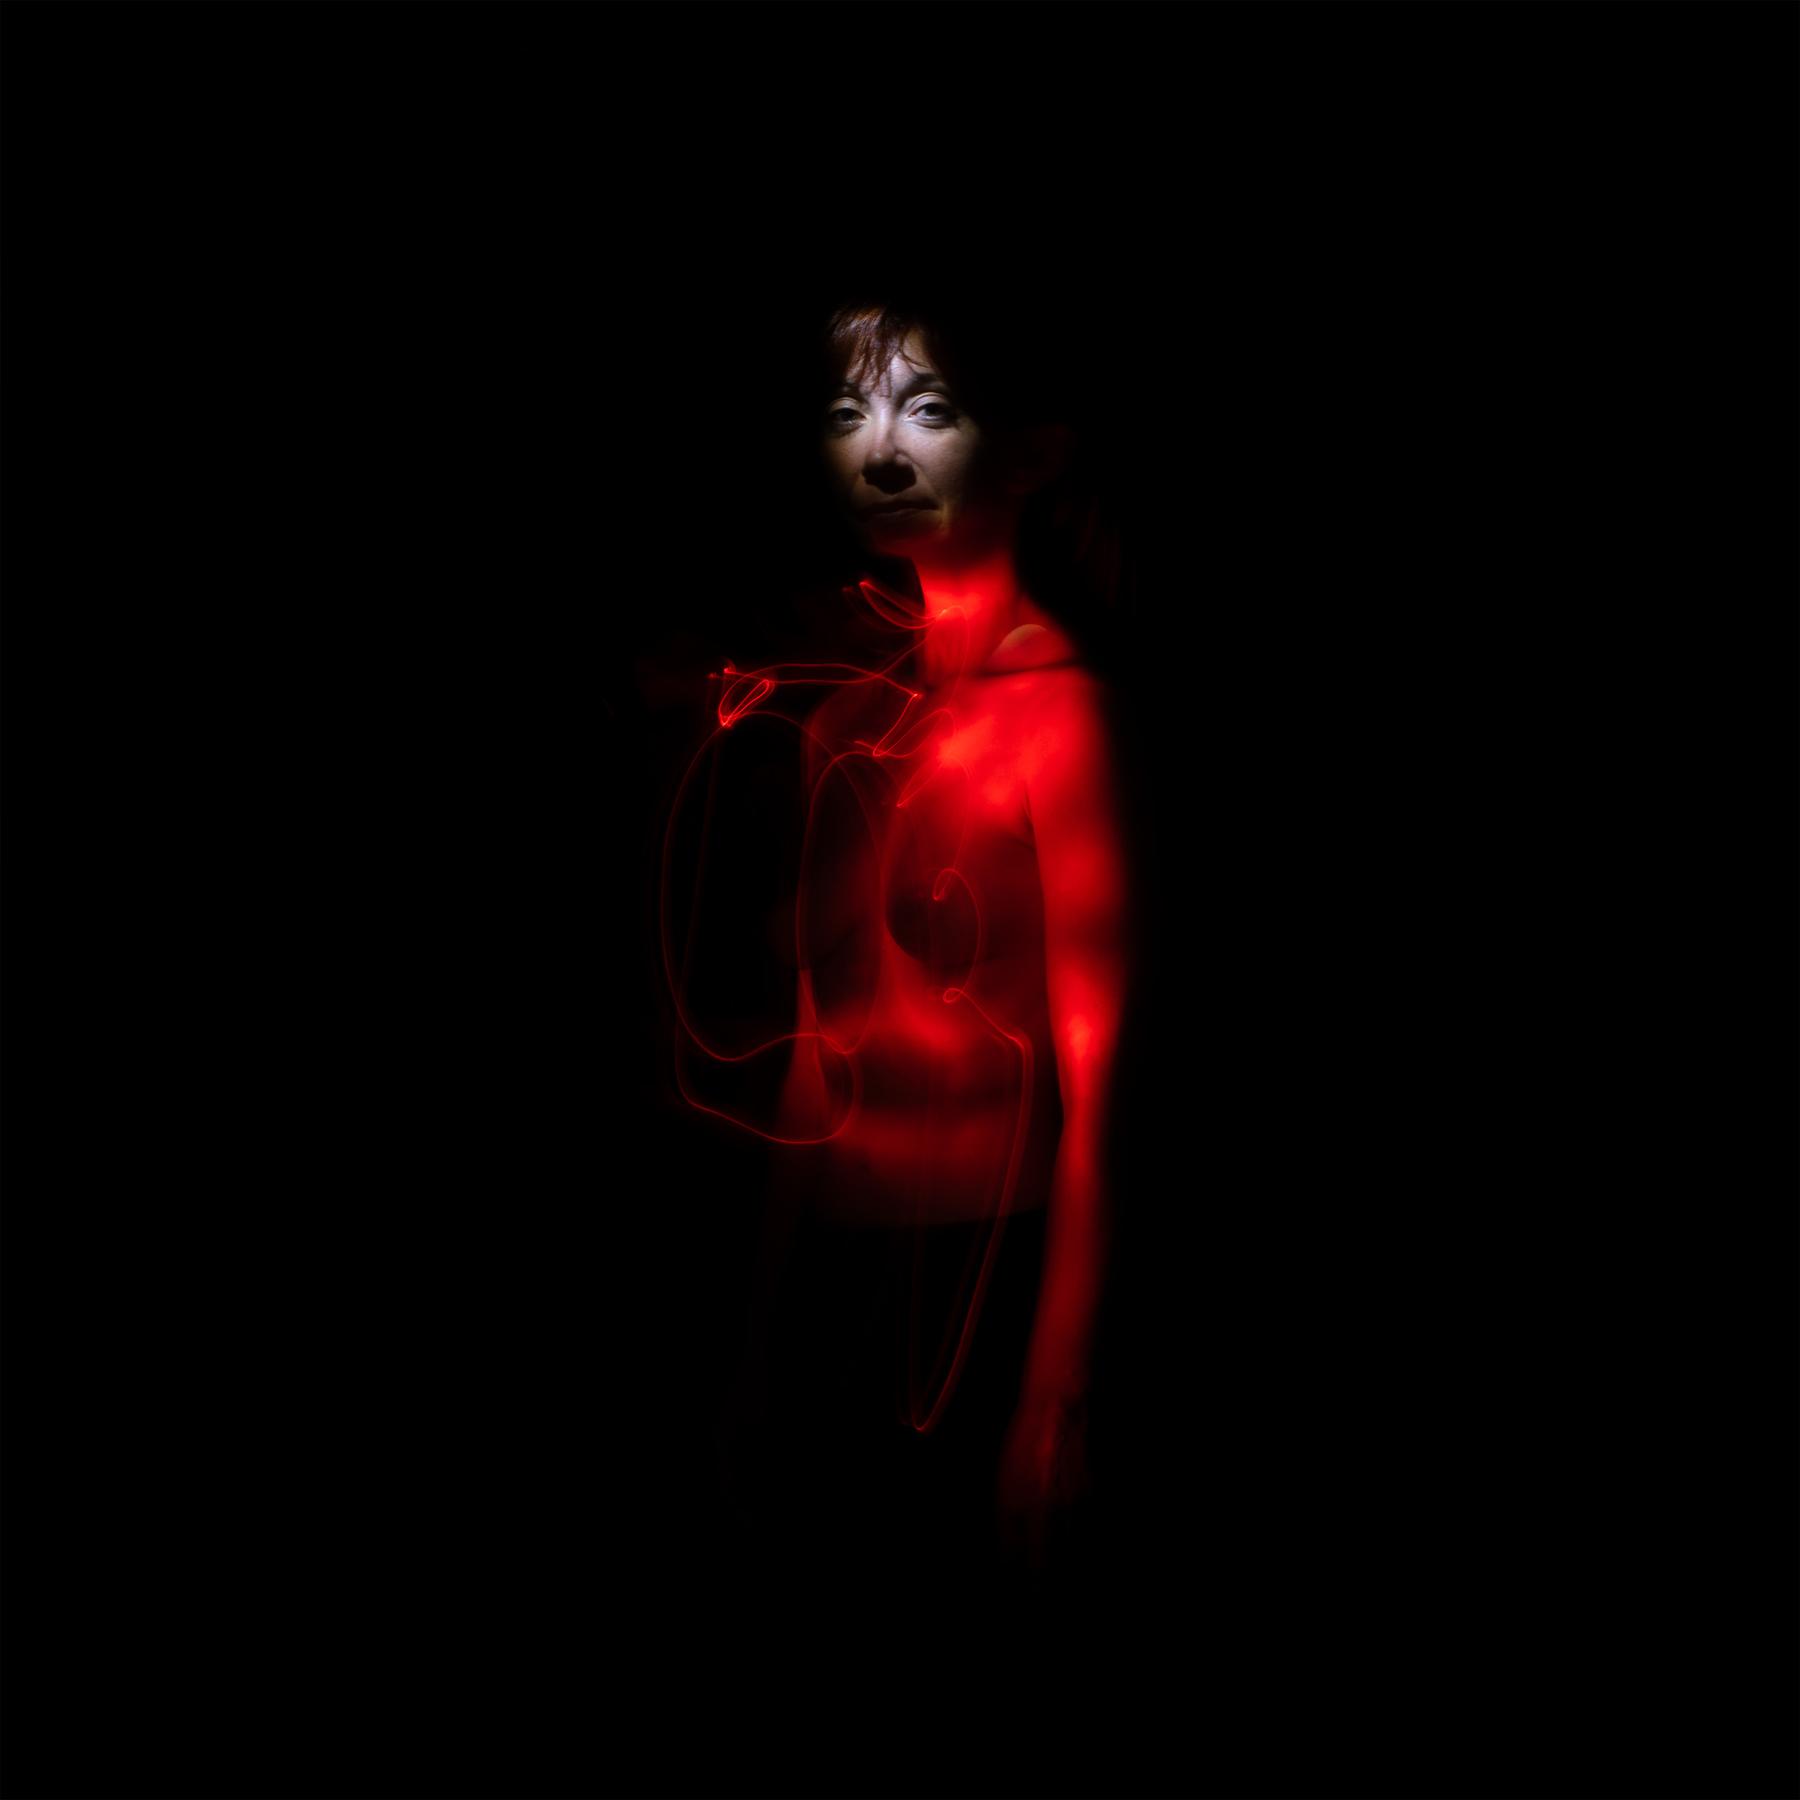 TRANS-FIGURA by Claire Clelia Baldo